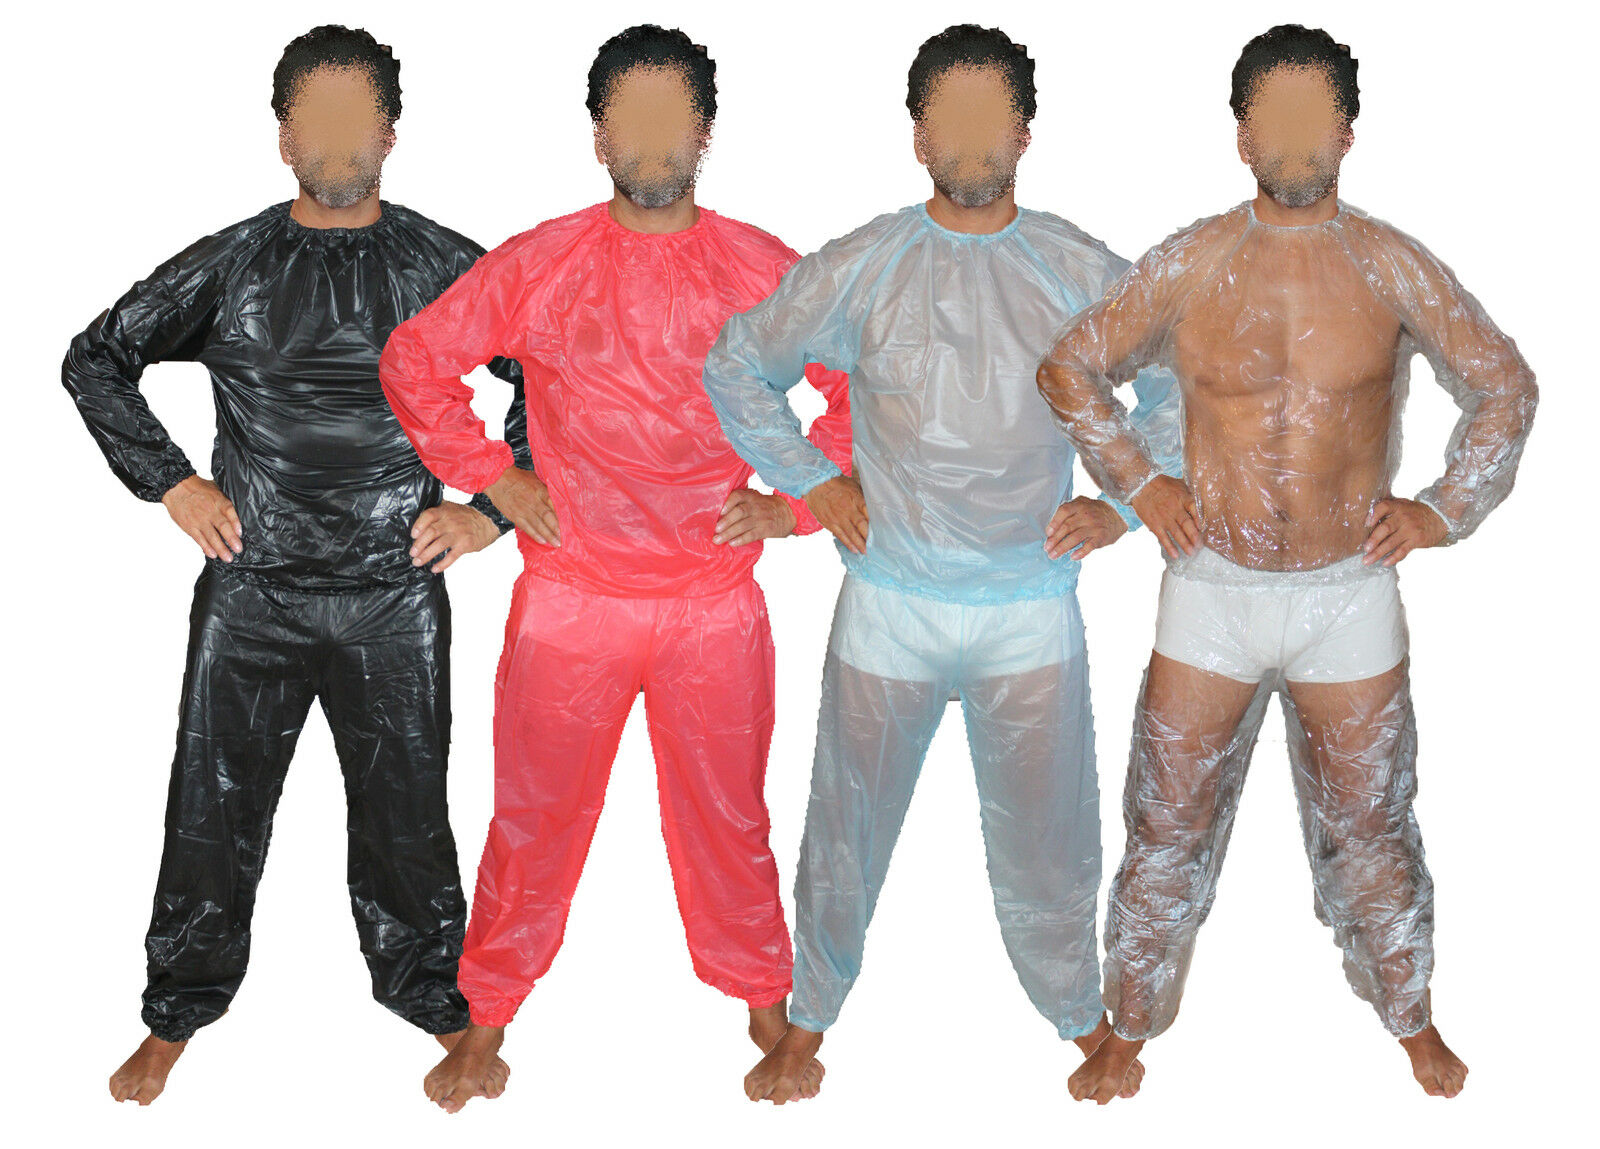 Super Soft PVC Pijama Braga-Pañal Traje Sudadero de la Sauna Sauna la Pantalones Goma a71759